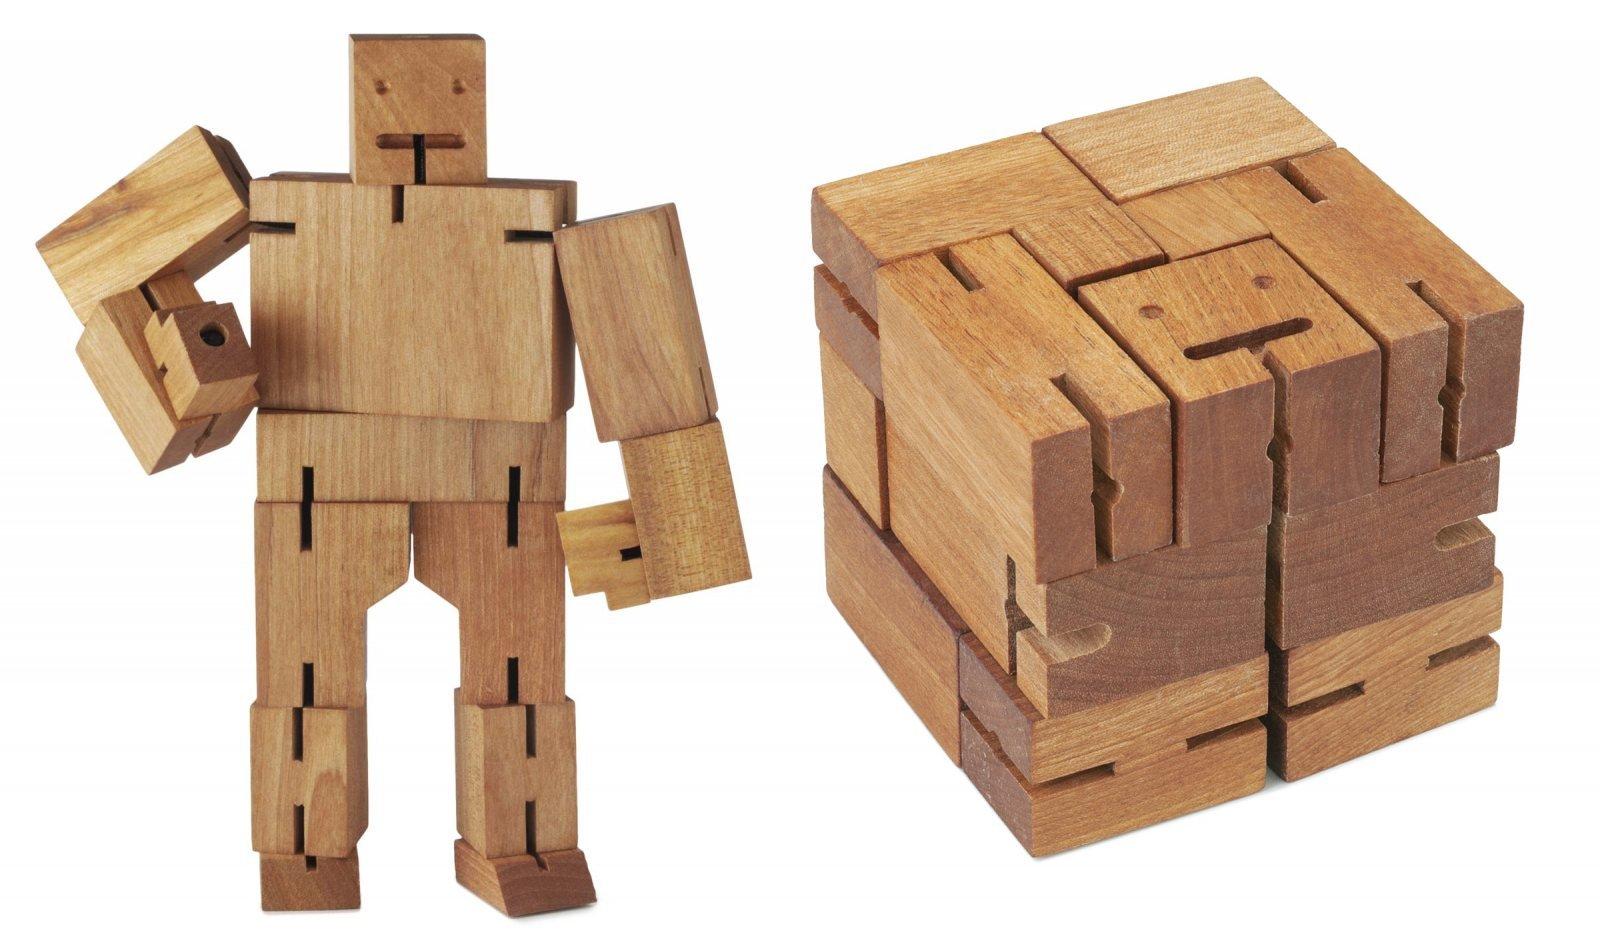 Puzzle de madera cubebot ideas para regalar - Transferir fotos a madera ...